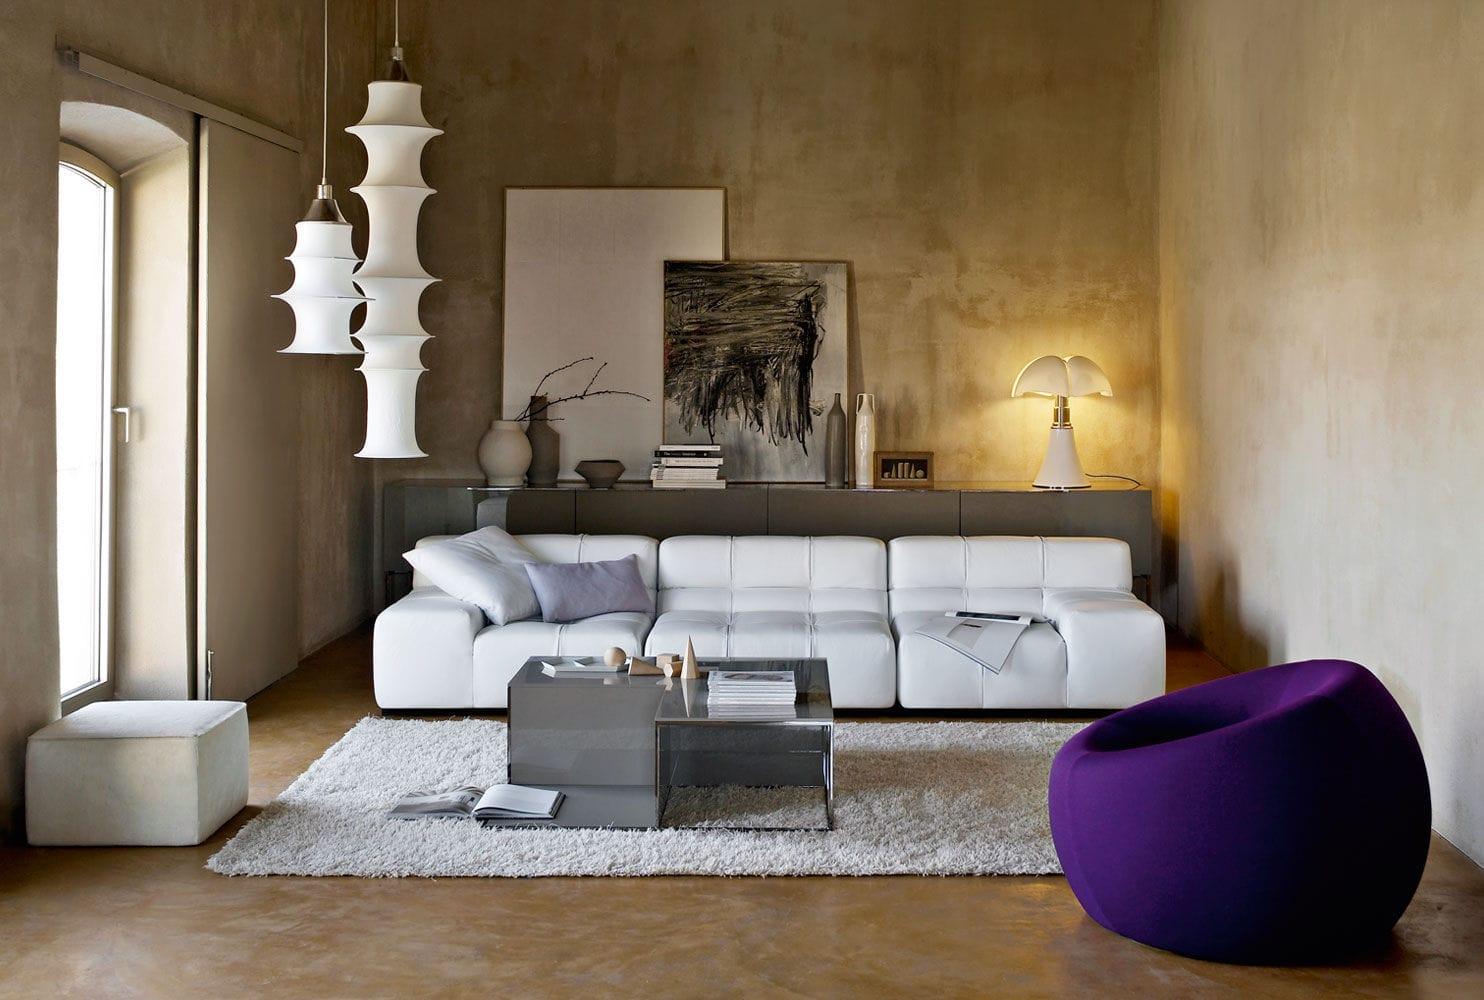 Modular sofa / contemporary / leather / by Patricia Urquiola